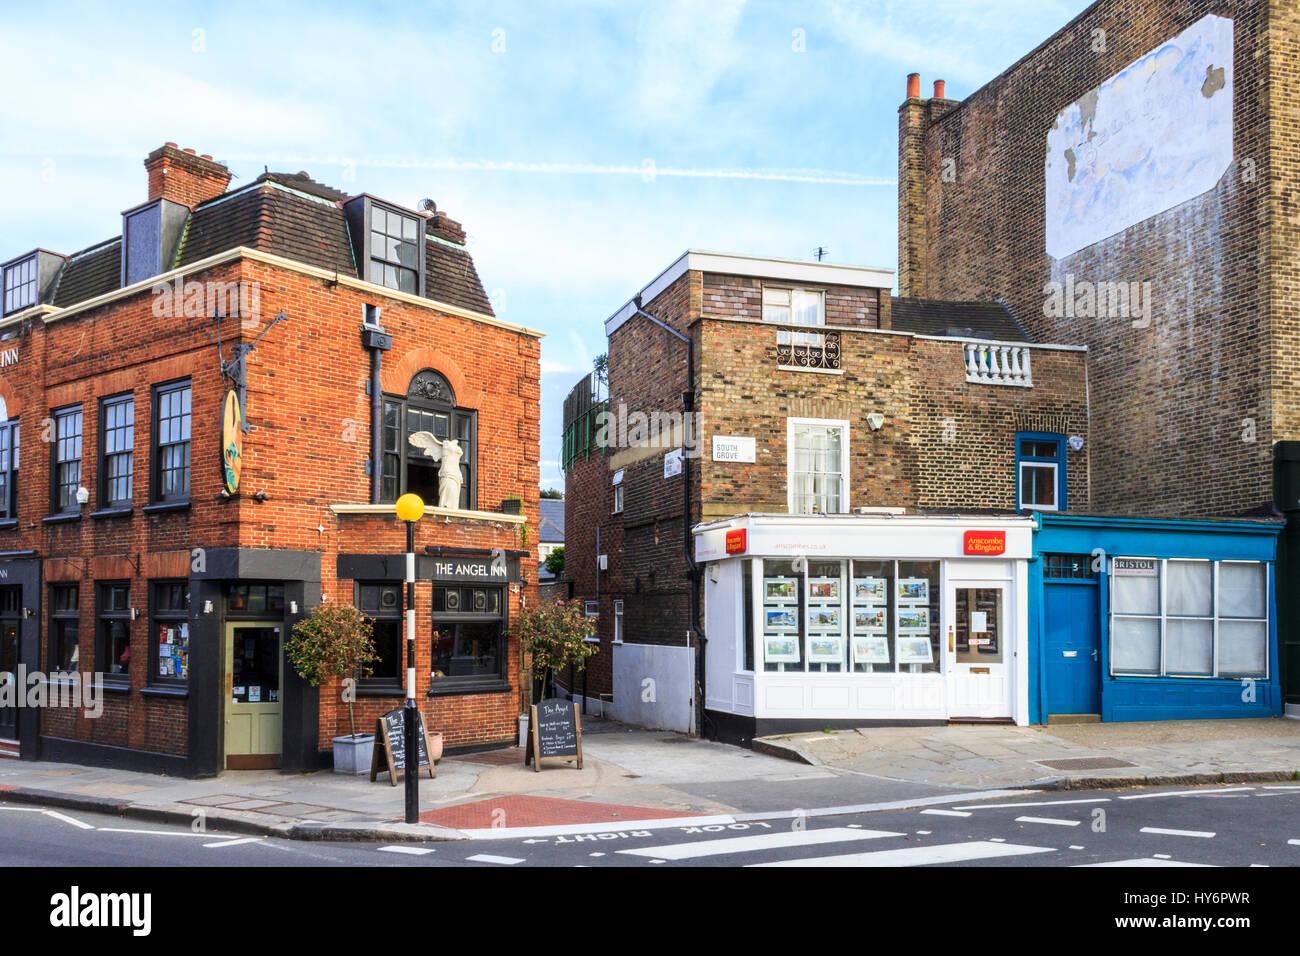 The historic Angel Inn in Highgate Village, London, UK Stock Photo